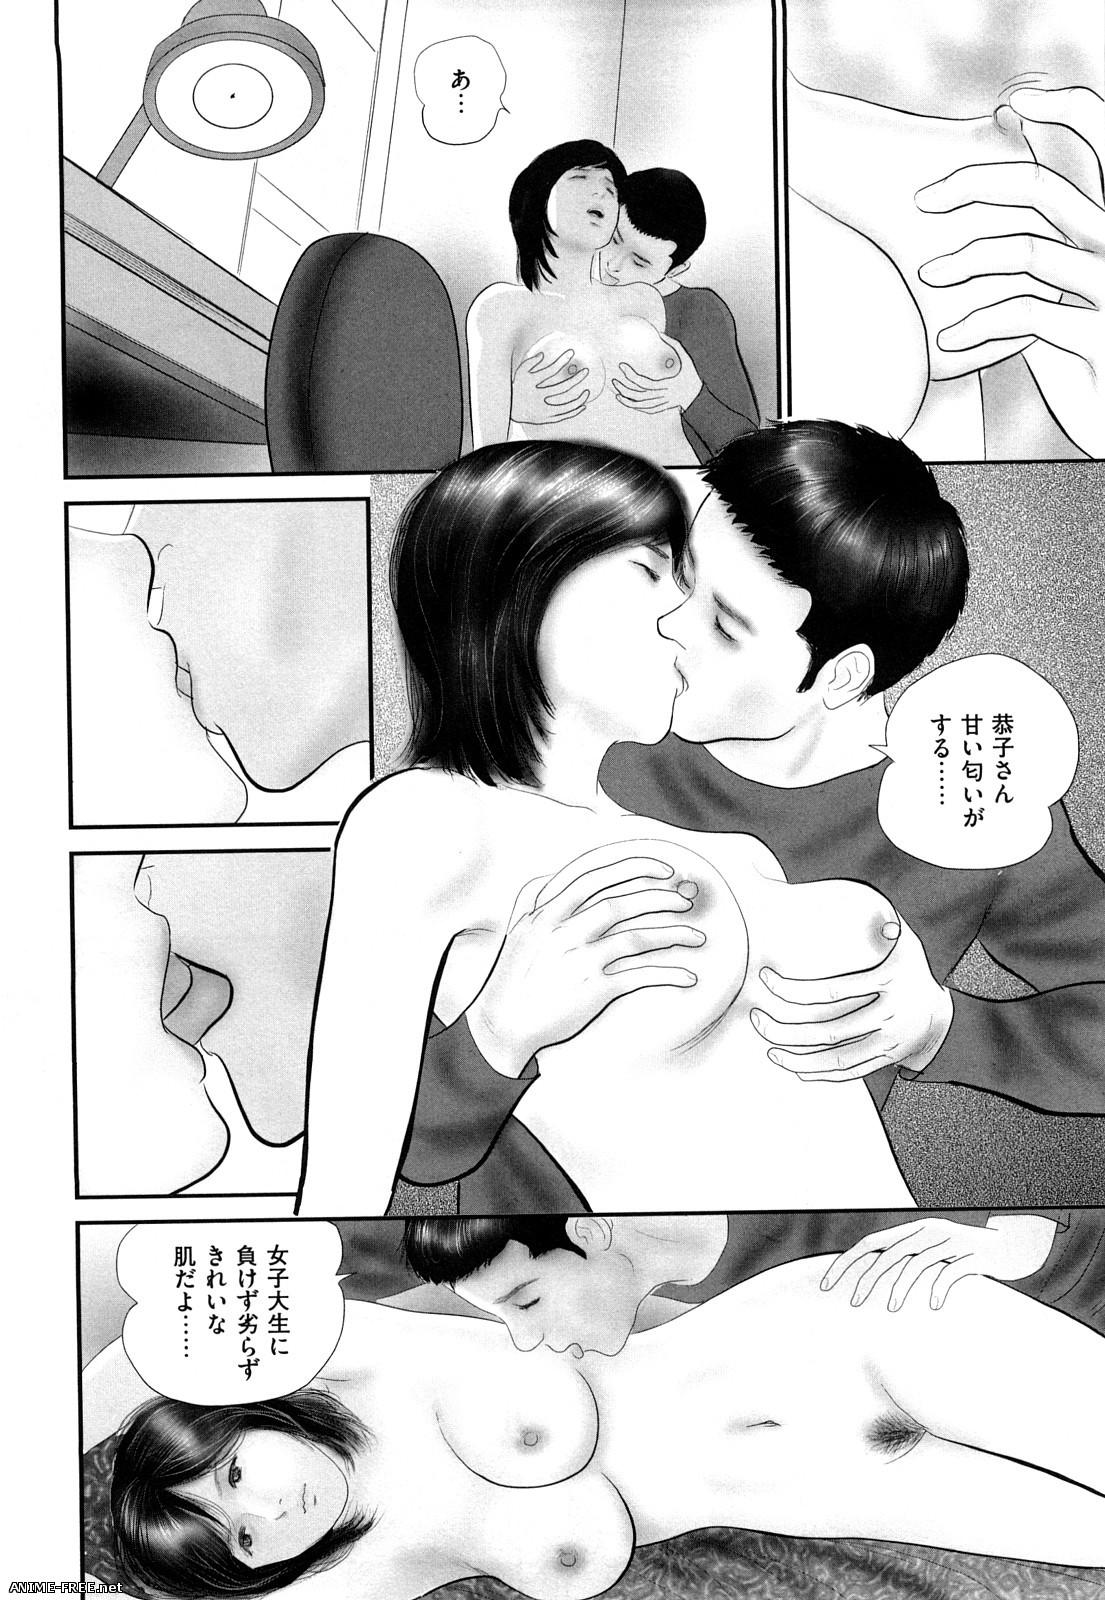 Suzuki Hiromichi - Коллекция хентай манги [Ptcen] [JAP] Manga Hentai